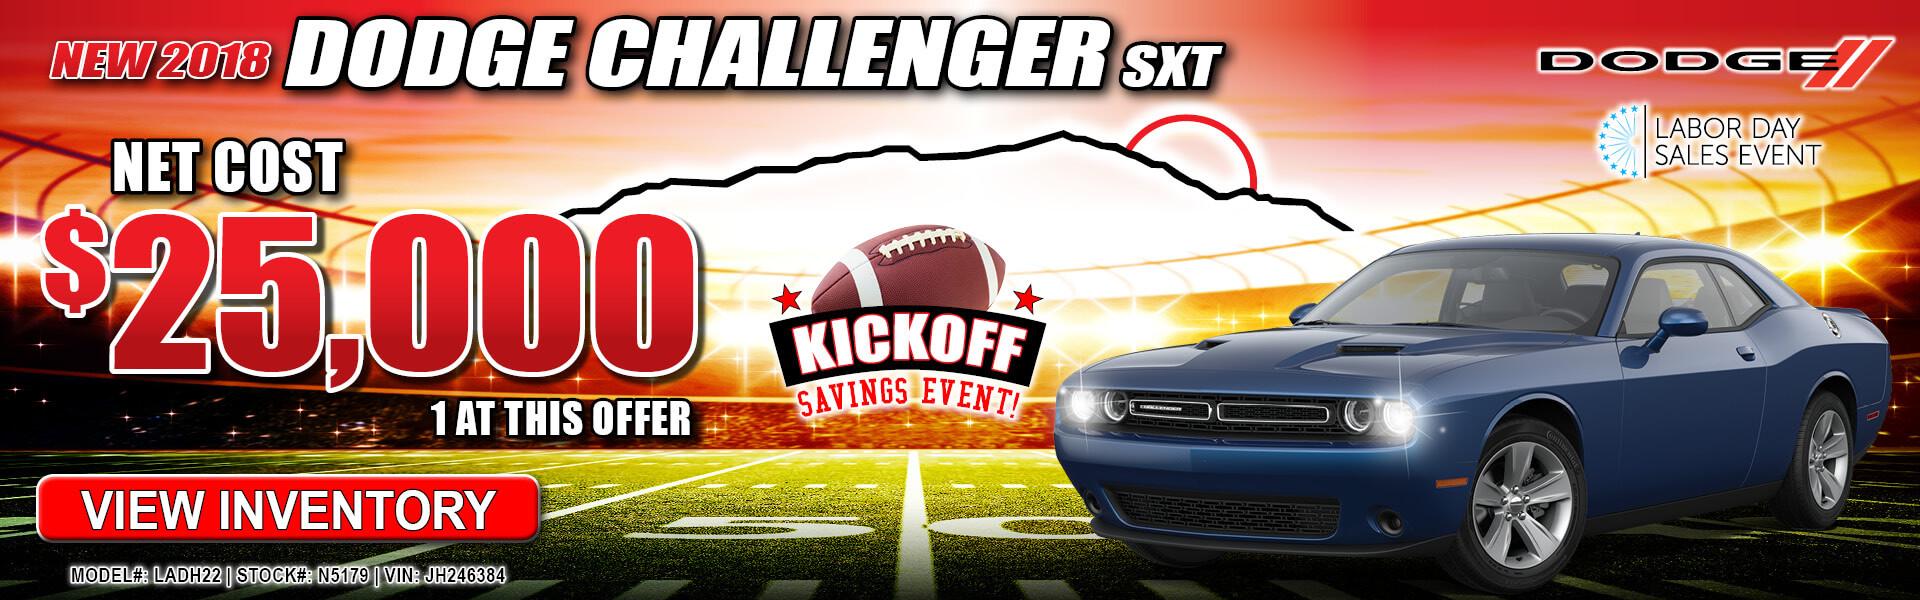 Dodge Challenger $25,000